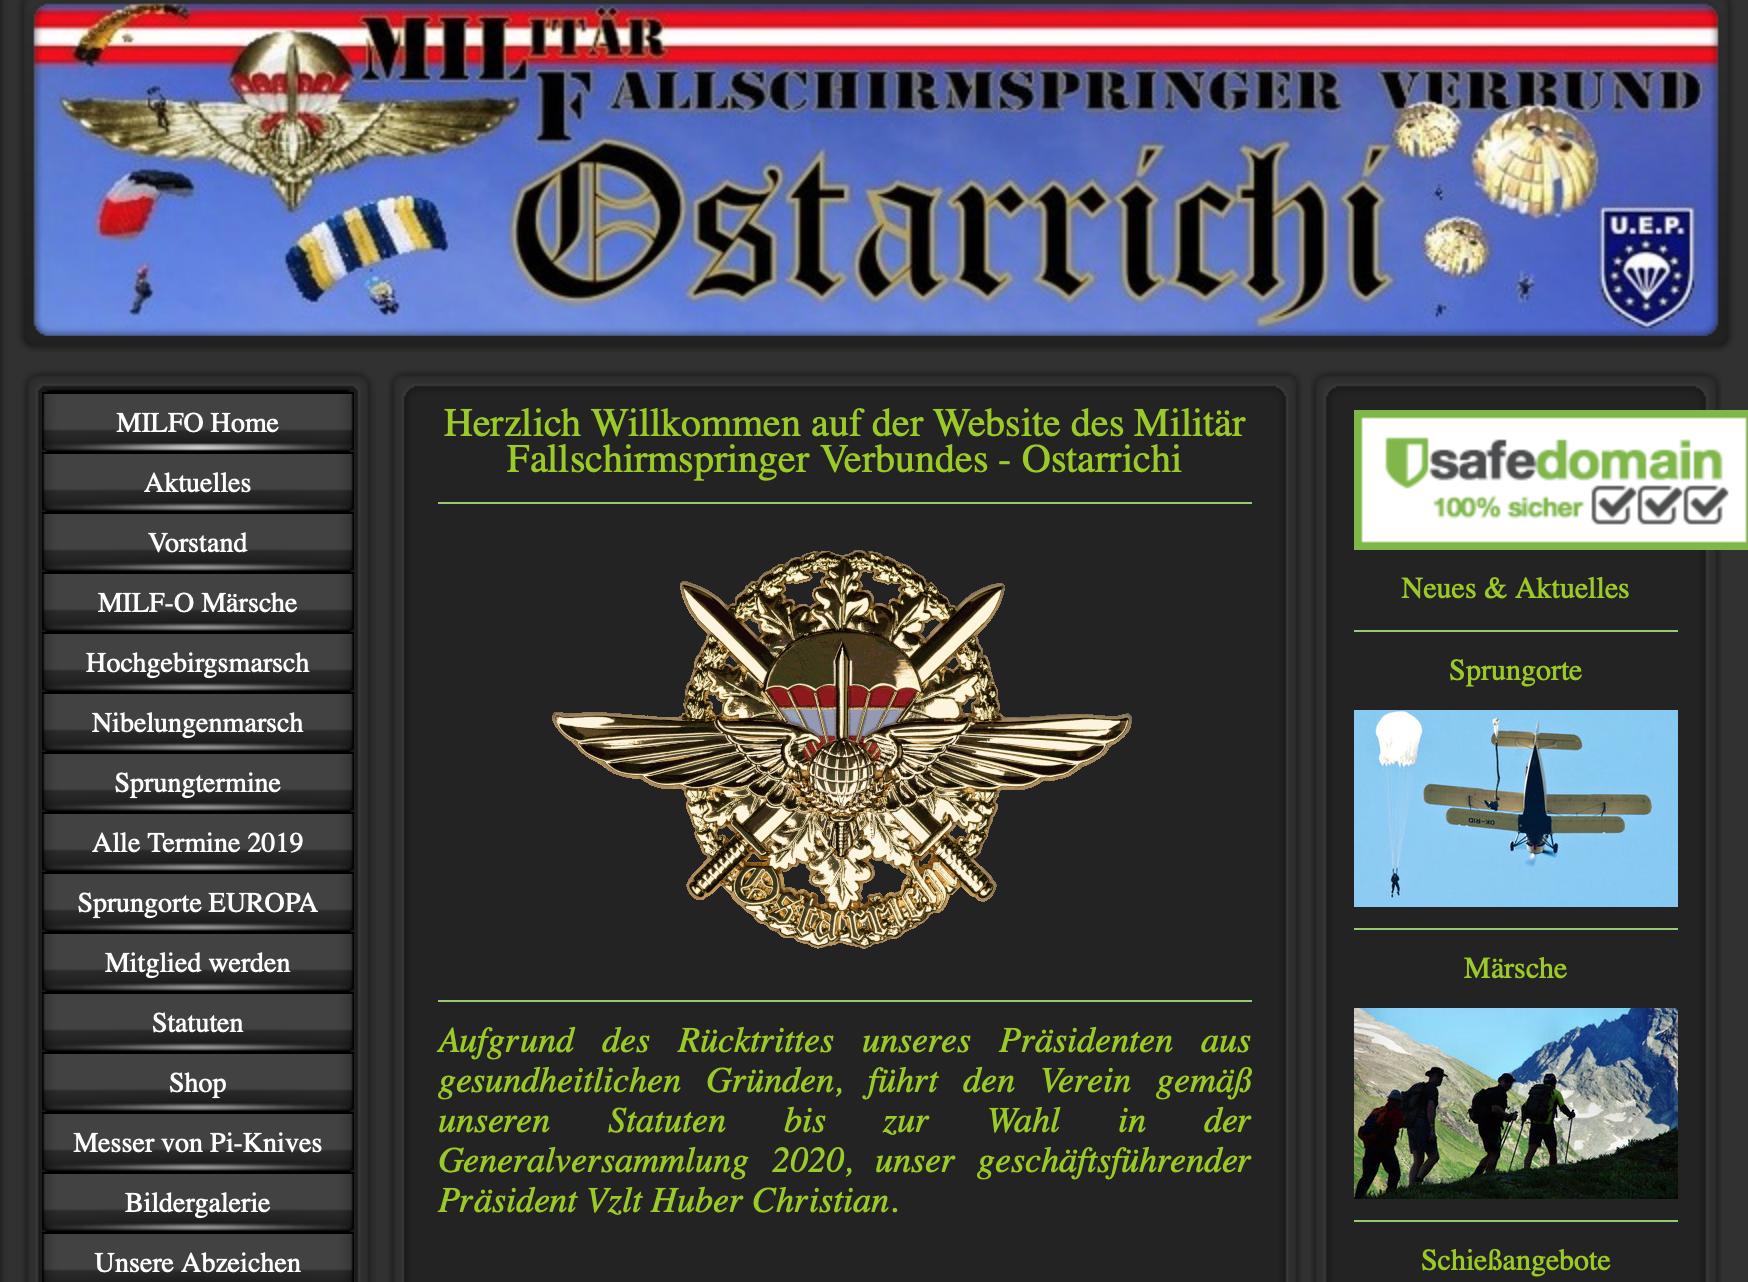 Webauftritt MILF-O: Märsche, Messer, Schießübungen